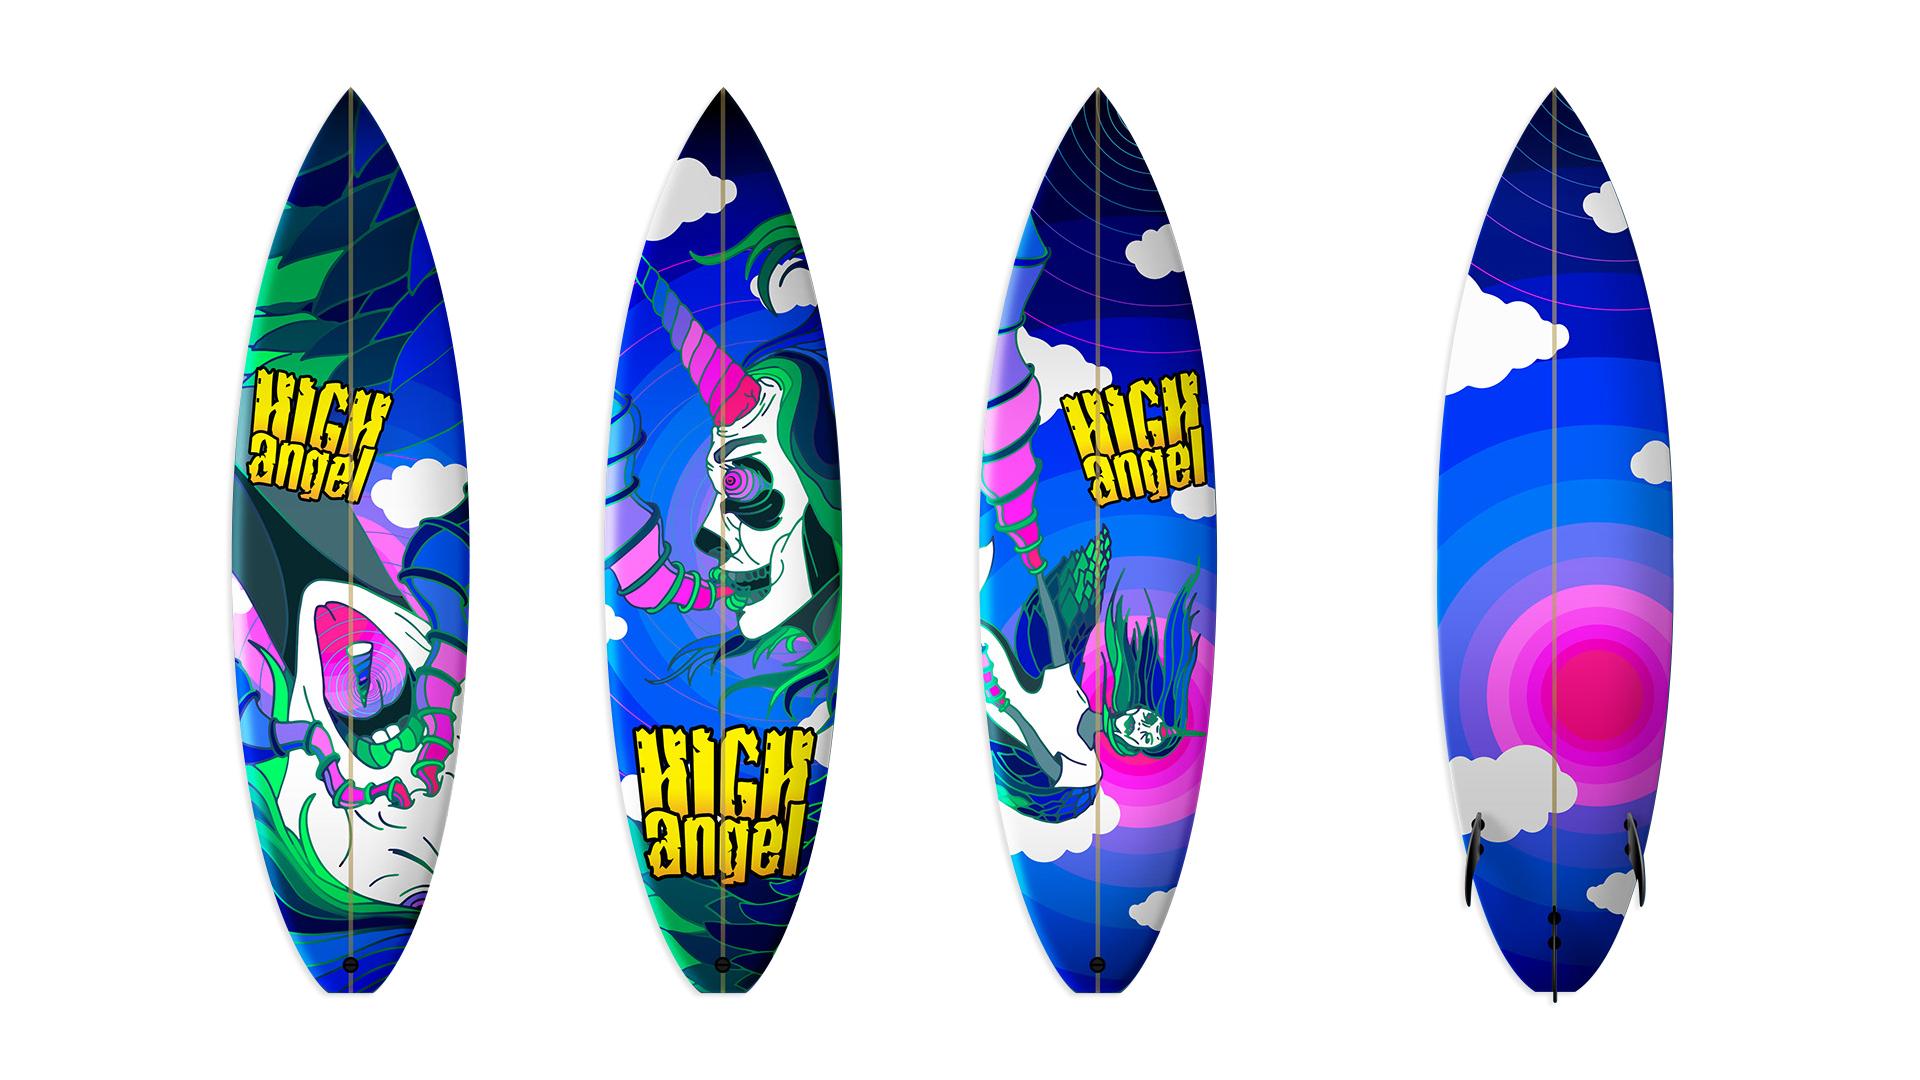 Final Illustration with mock-up on surfboard.